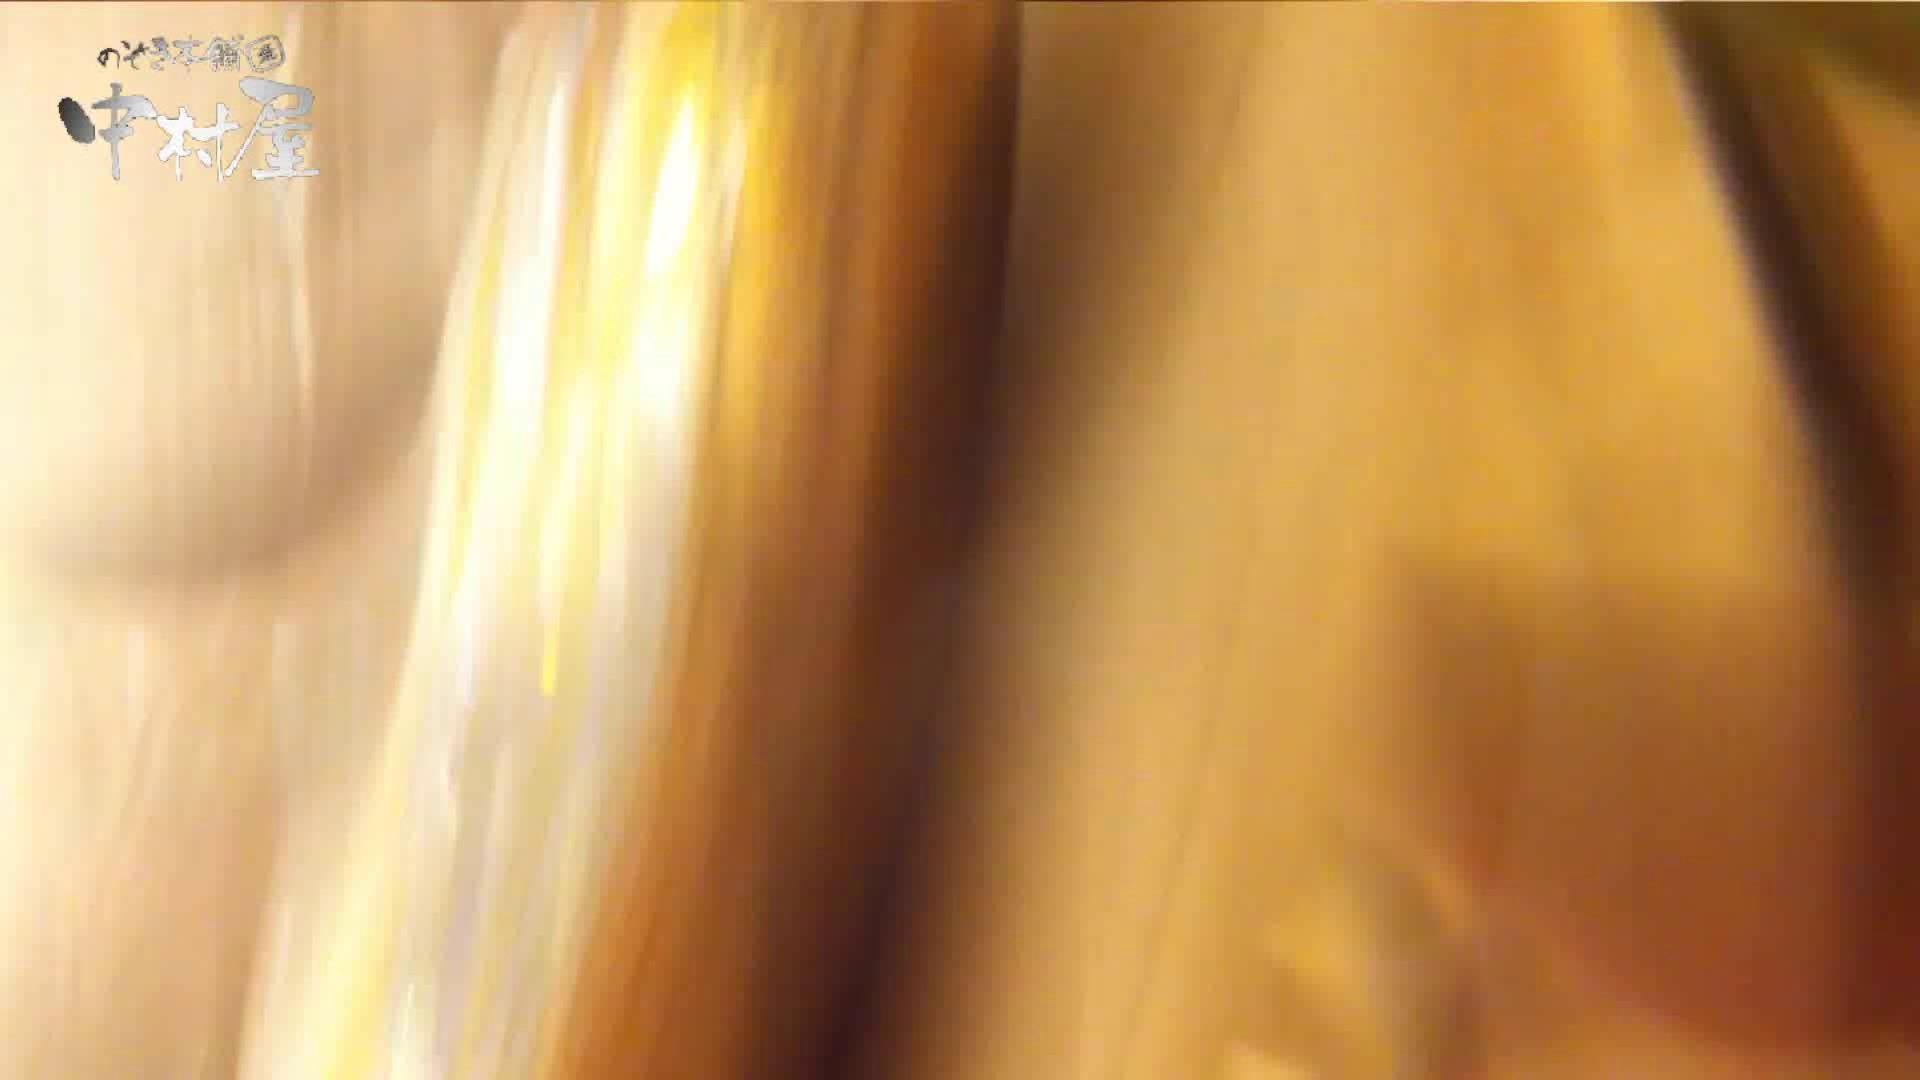 vol.43 可愛いカリスマ店員限定‼胸チラ&パンチラ 美脚おねーさんの胸元ゲット! パンチラ ヌード画像 76PIX 75